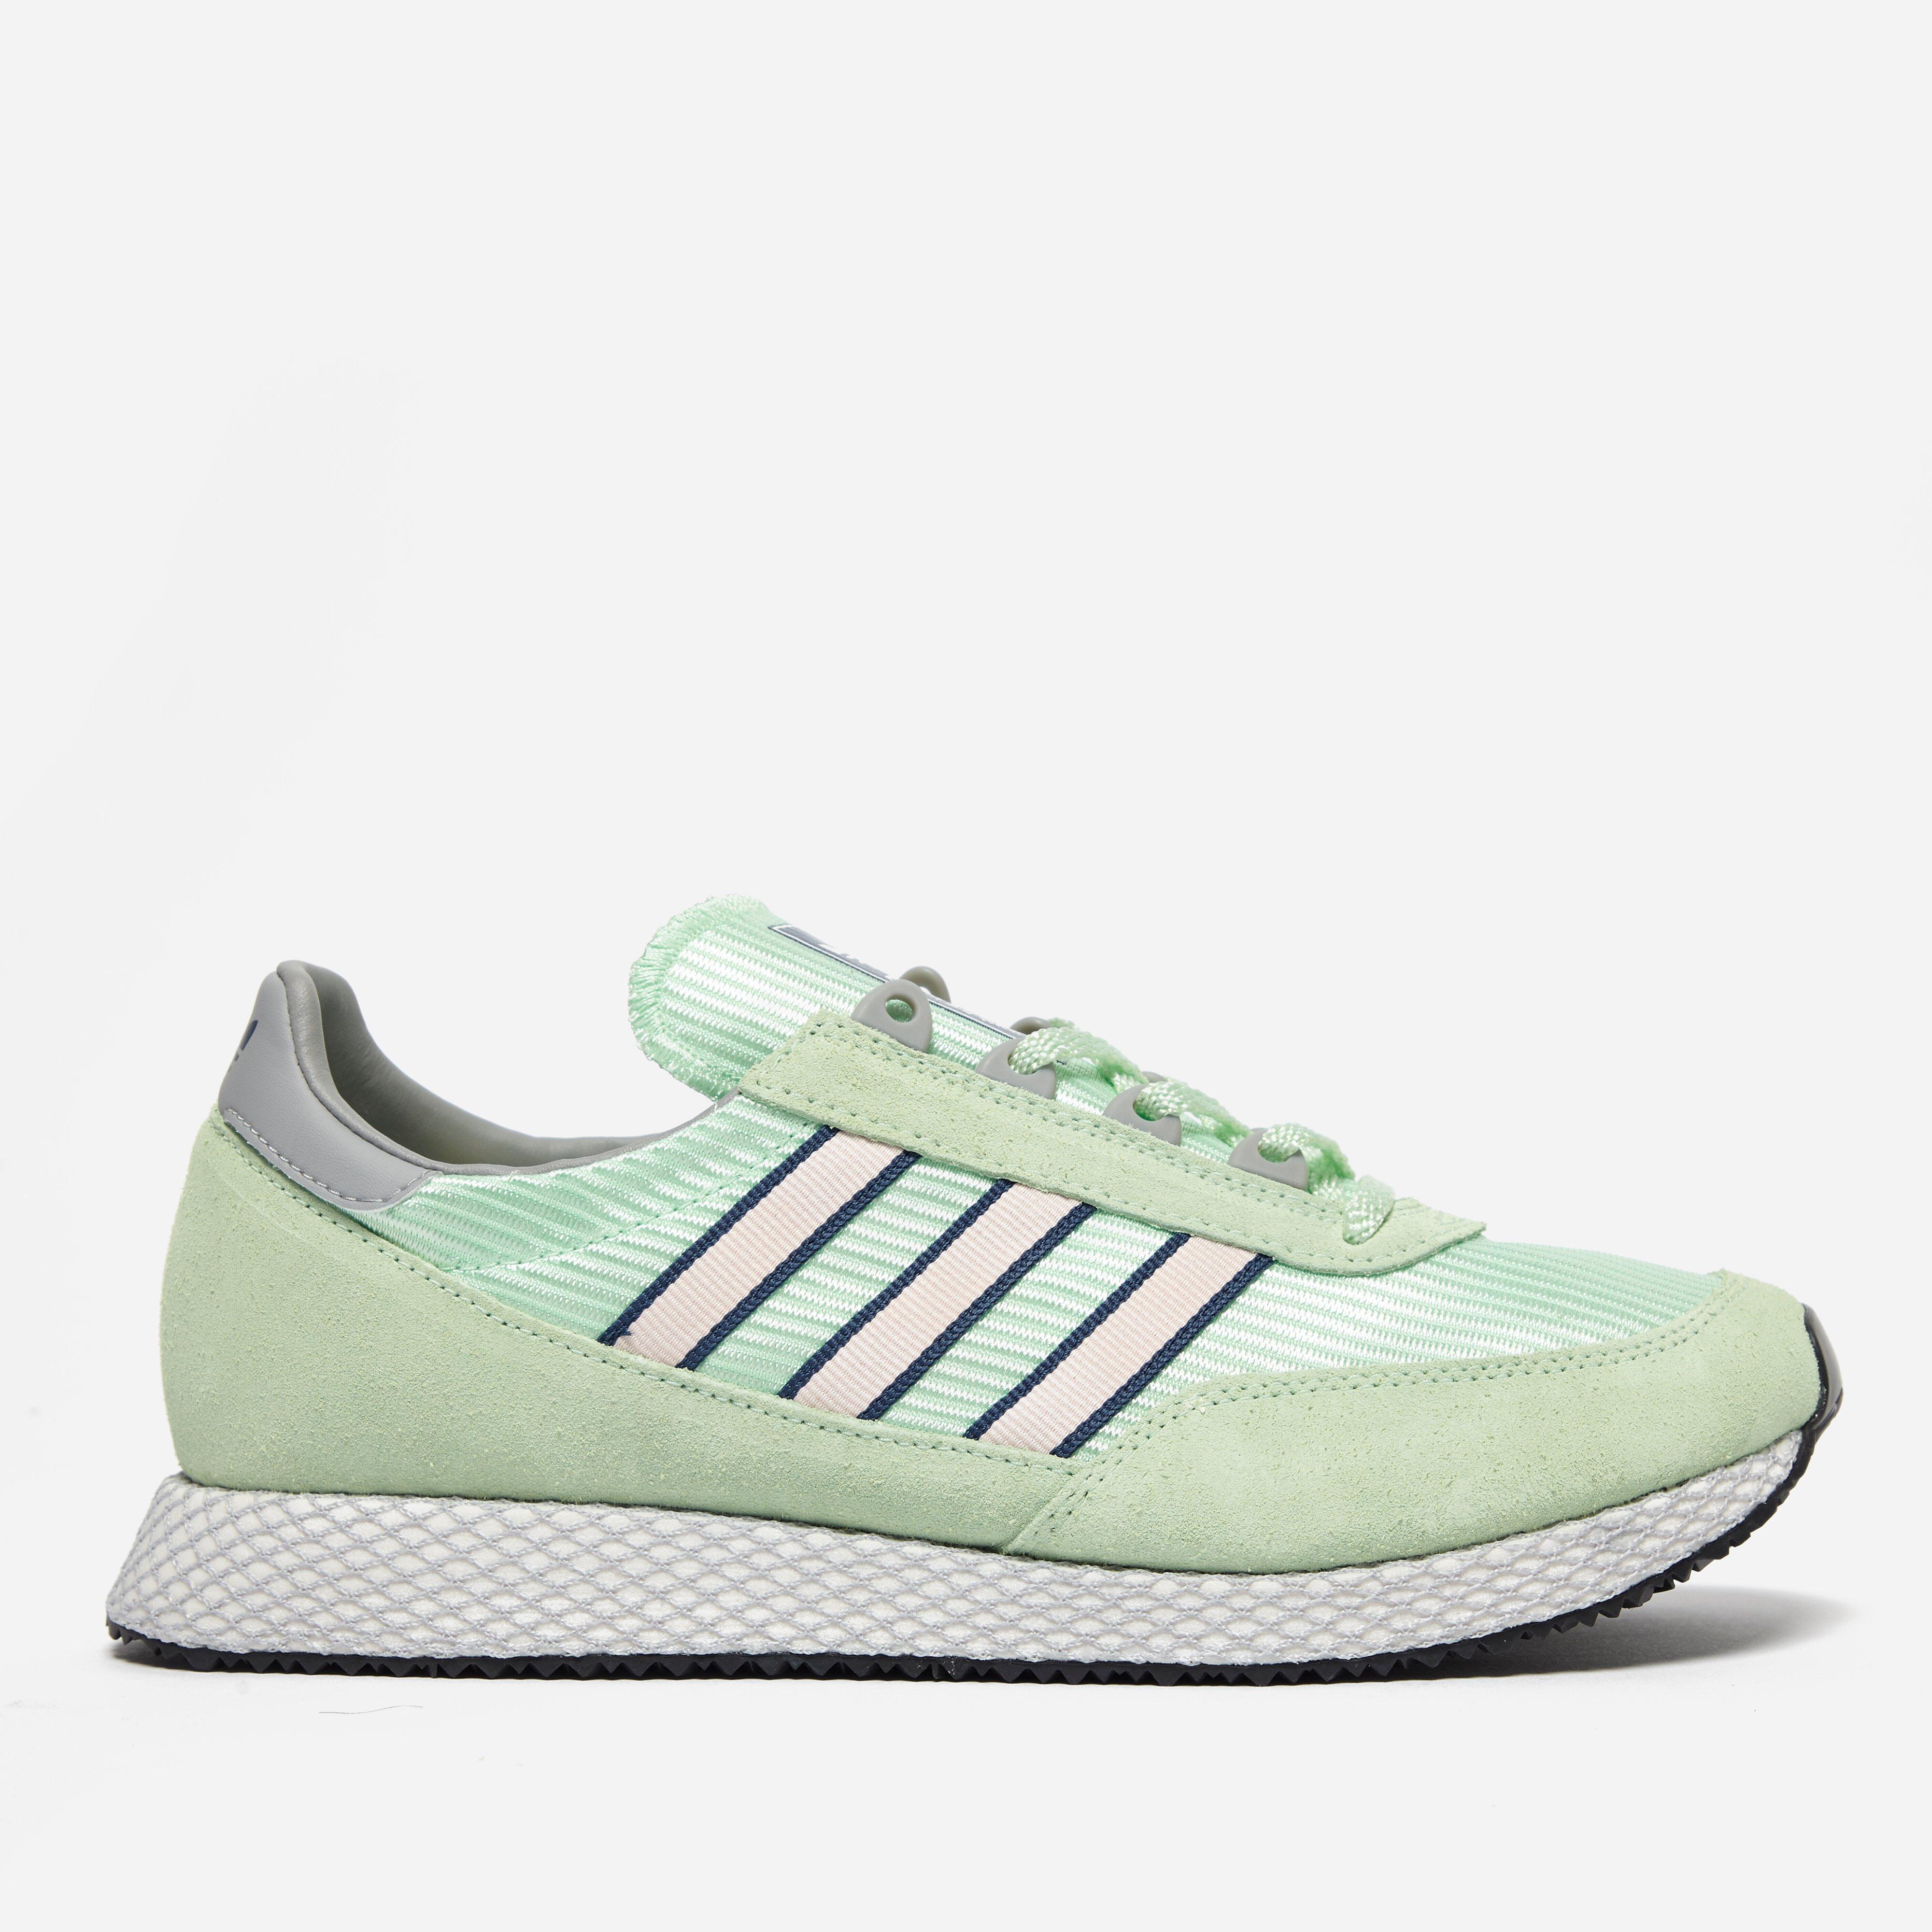 Glenbuck Spzl Suede And Nylon Sneakers - Greenadidas Originals vnQrw